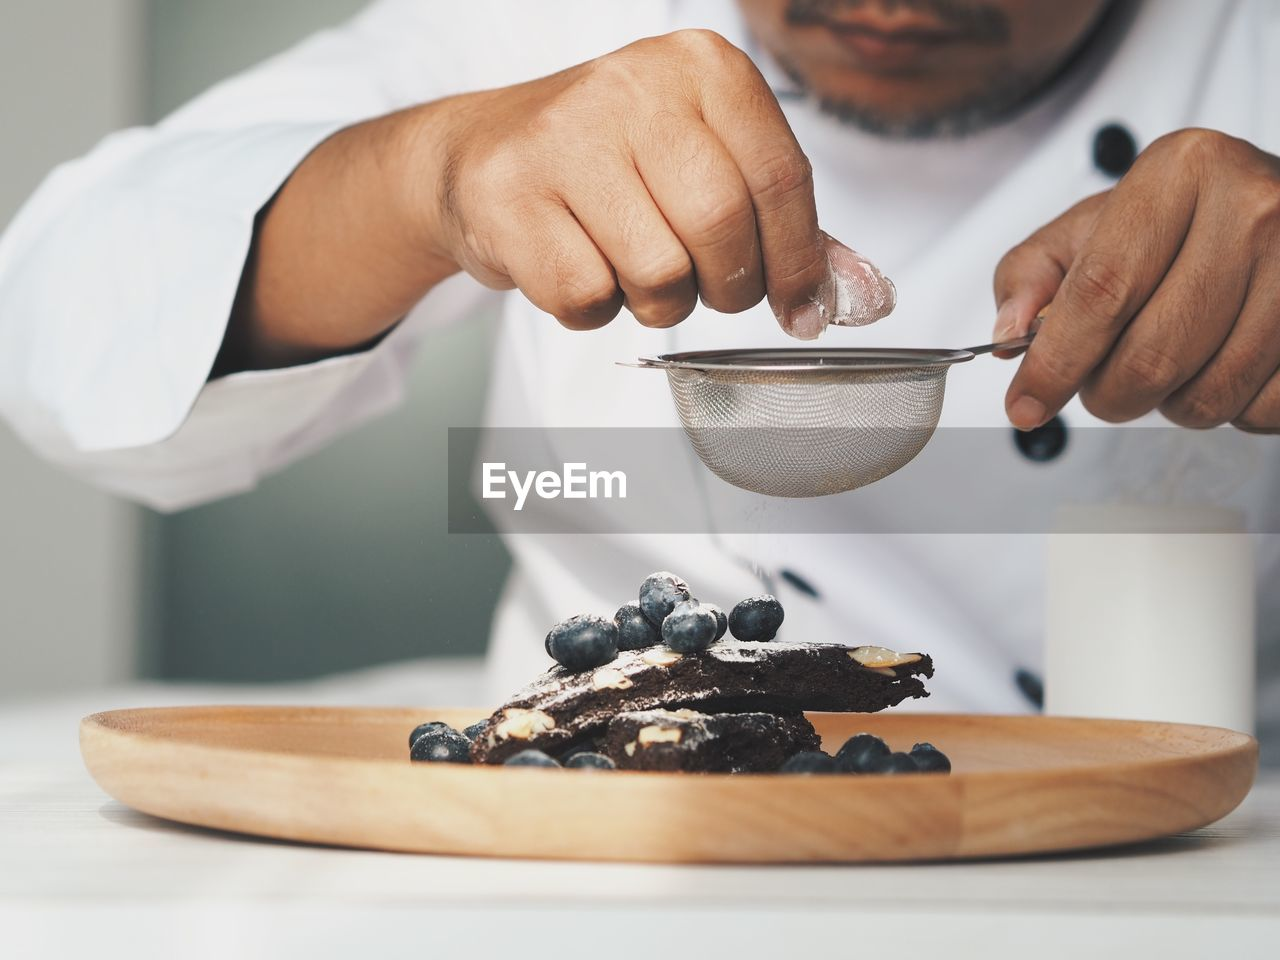 Midsection of chef garnishing dessert